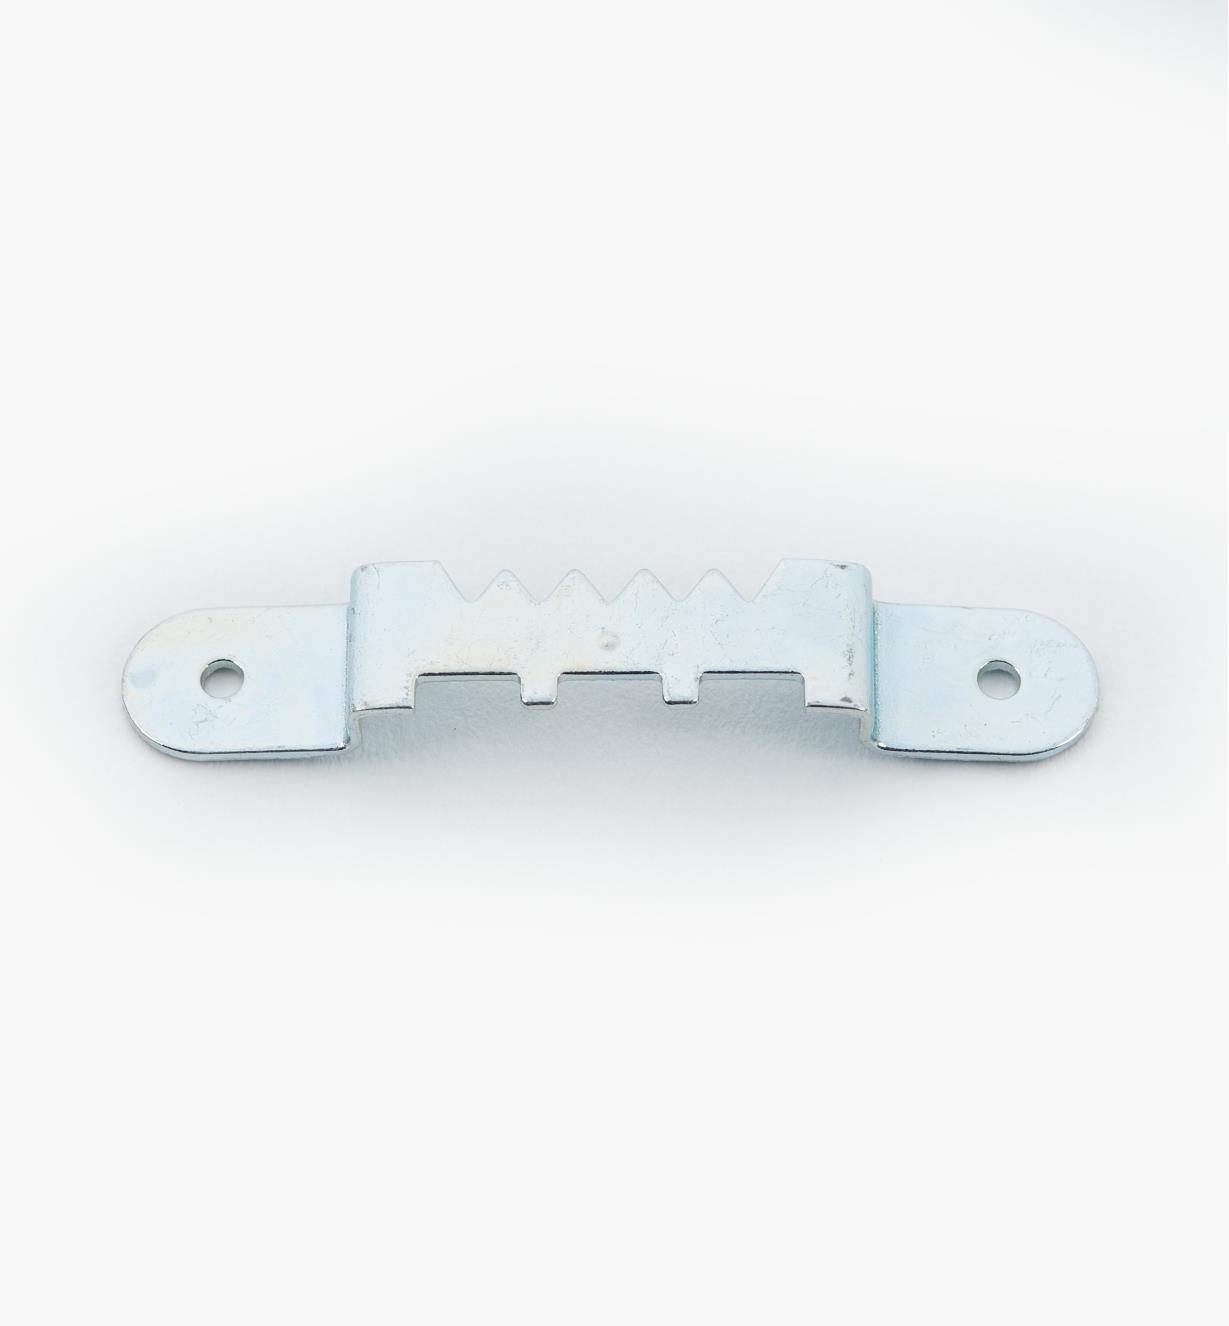 00H0705 - 5/16 inch x 1 3/4 Bar Hangers pkg of 100